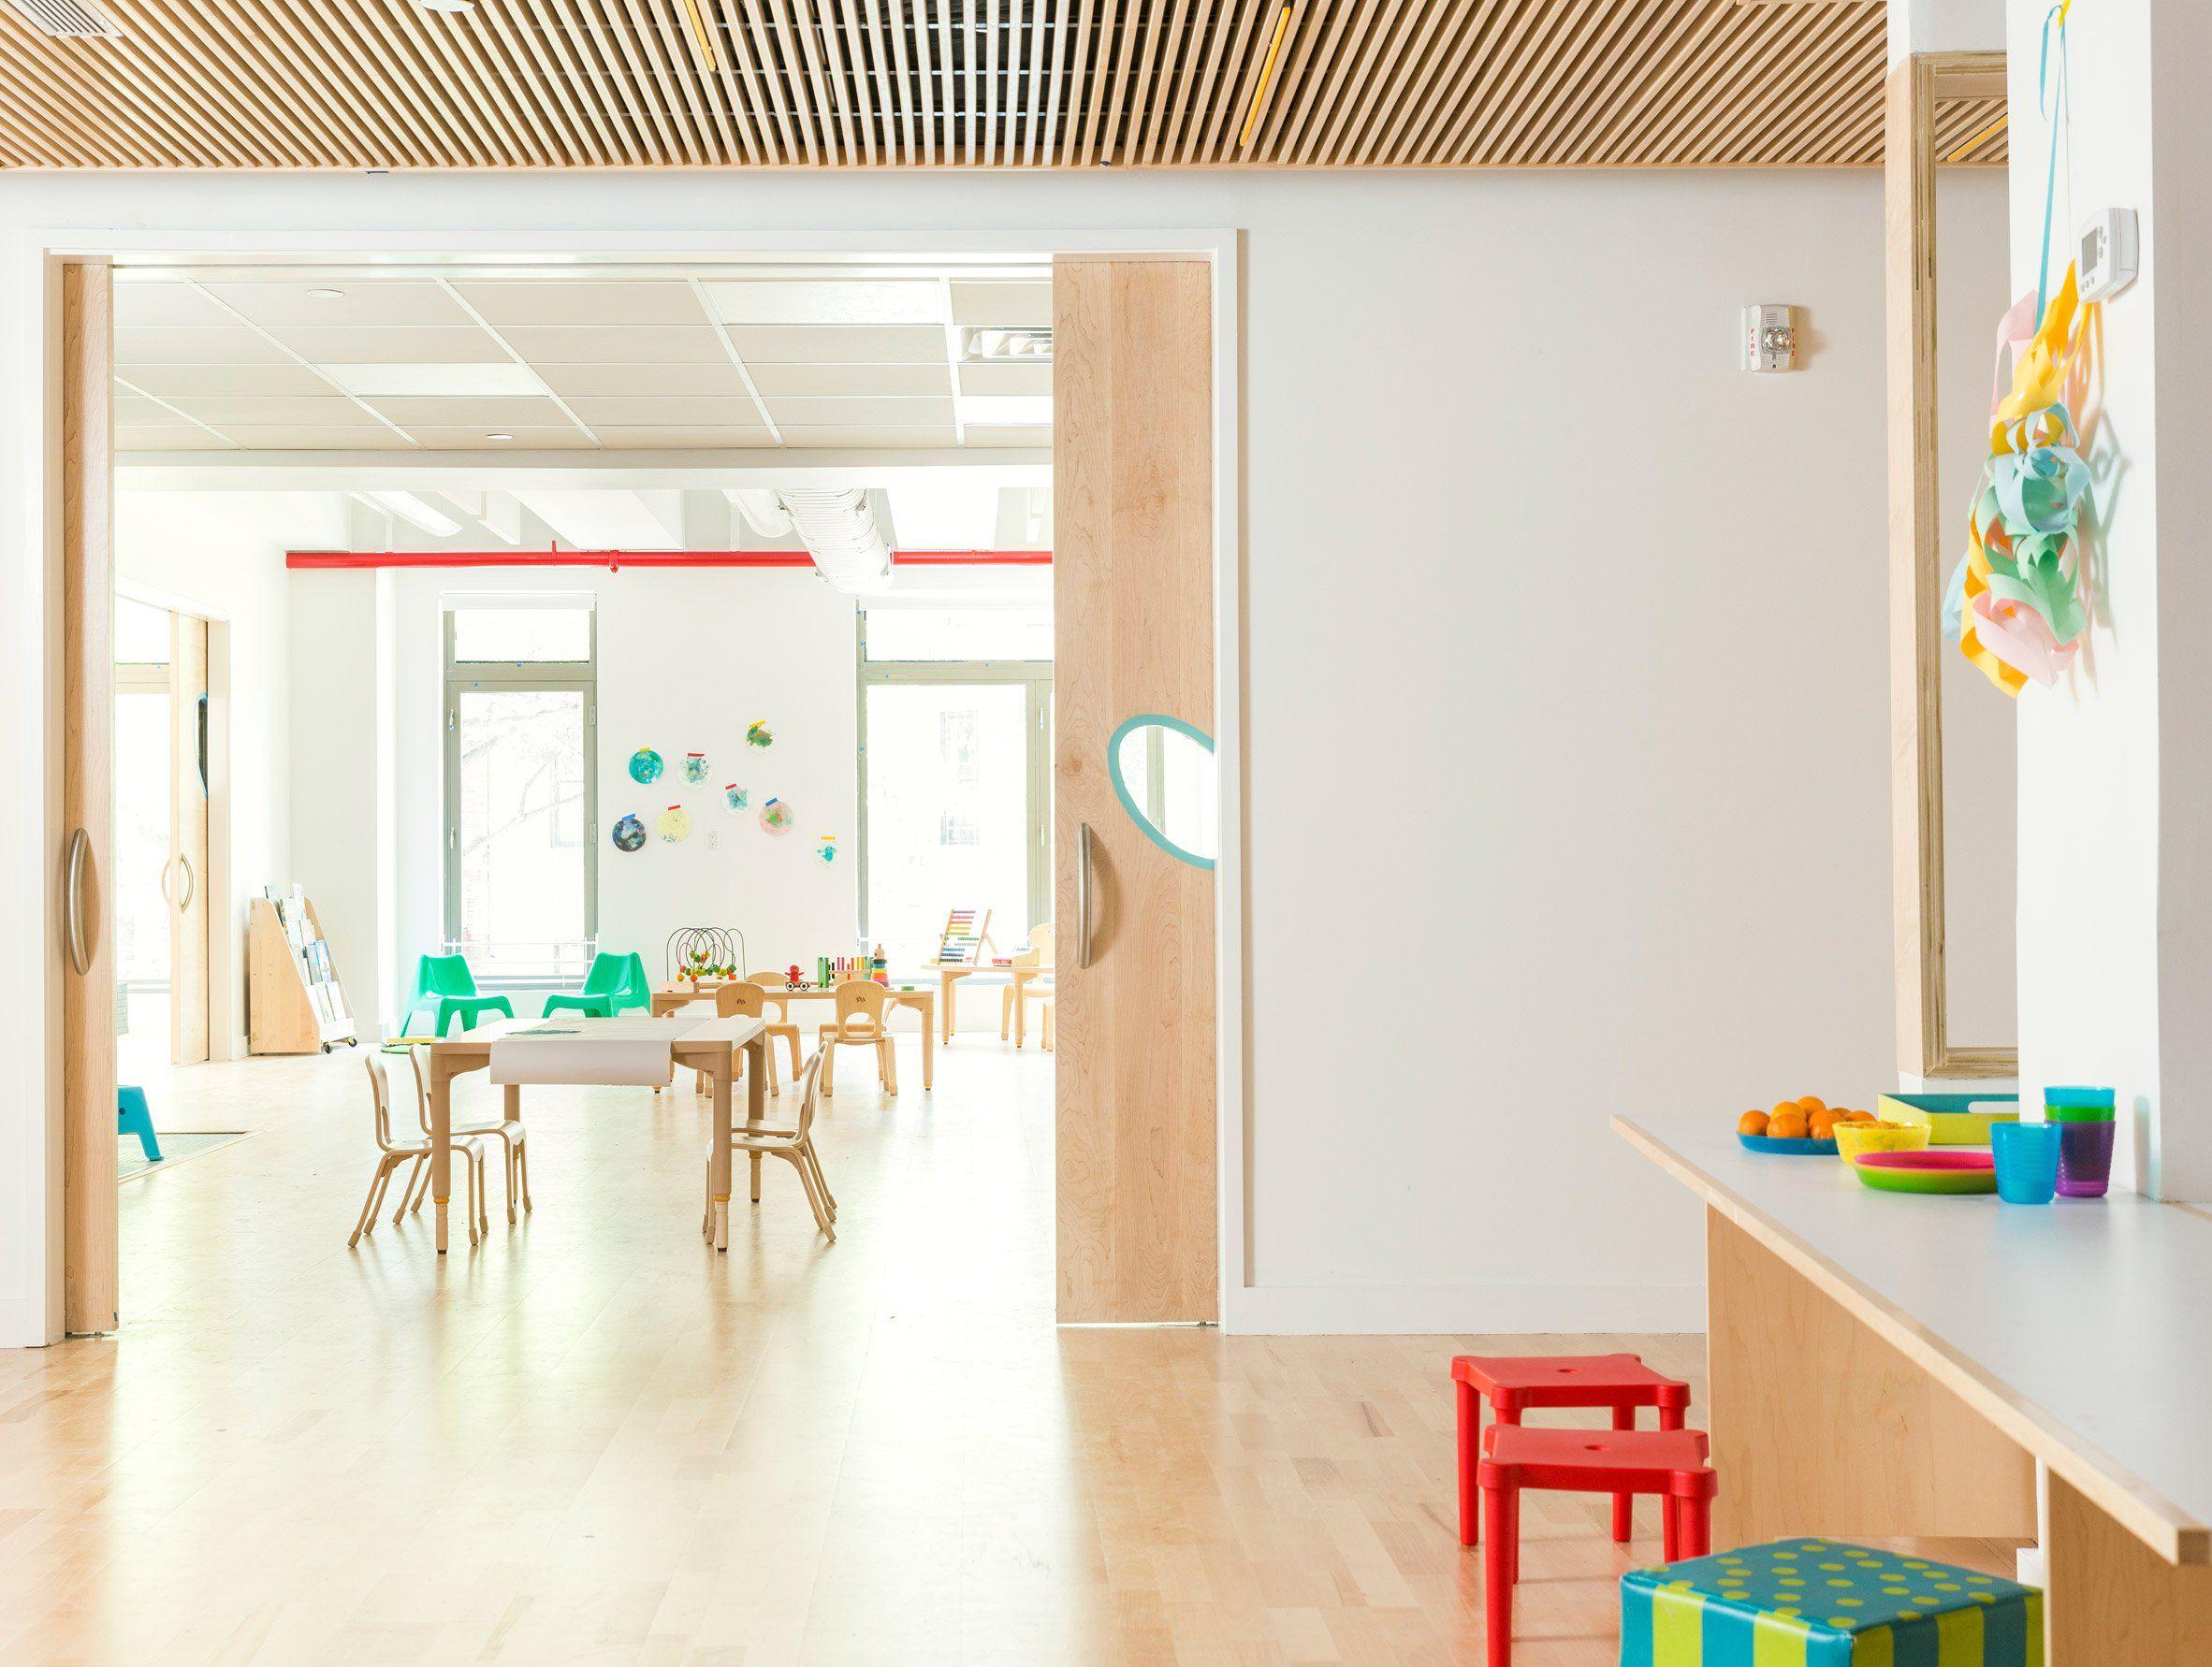 Maple Street School In Brooklyn Features Warm Wood Interiors